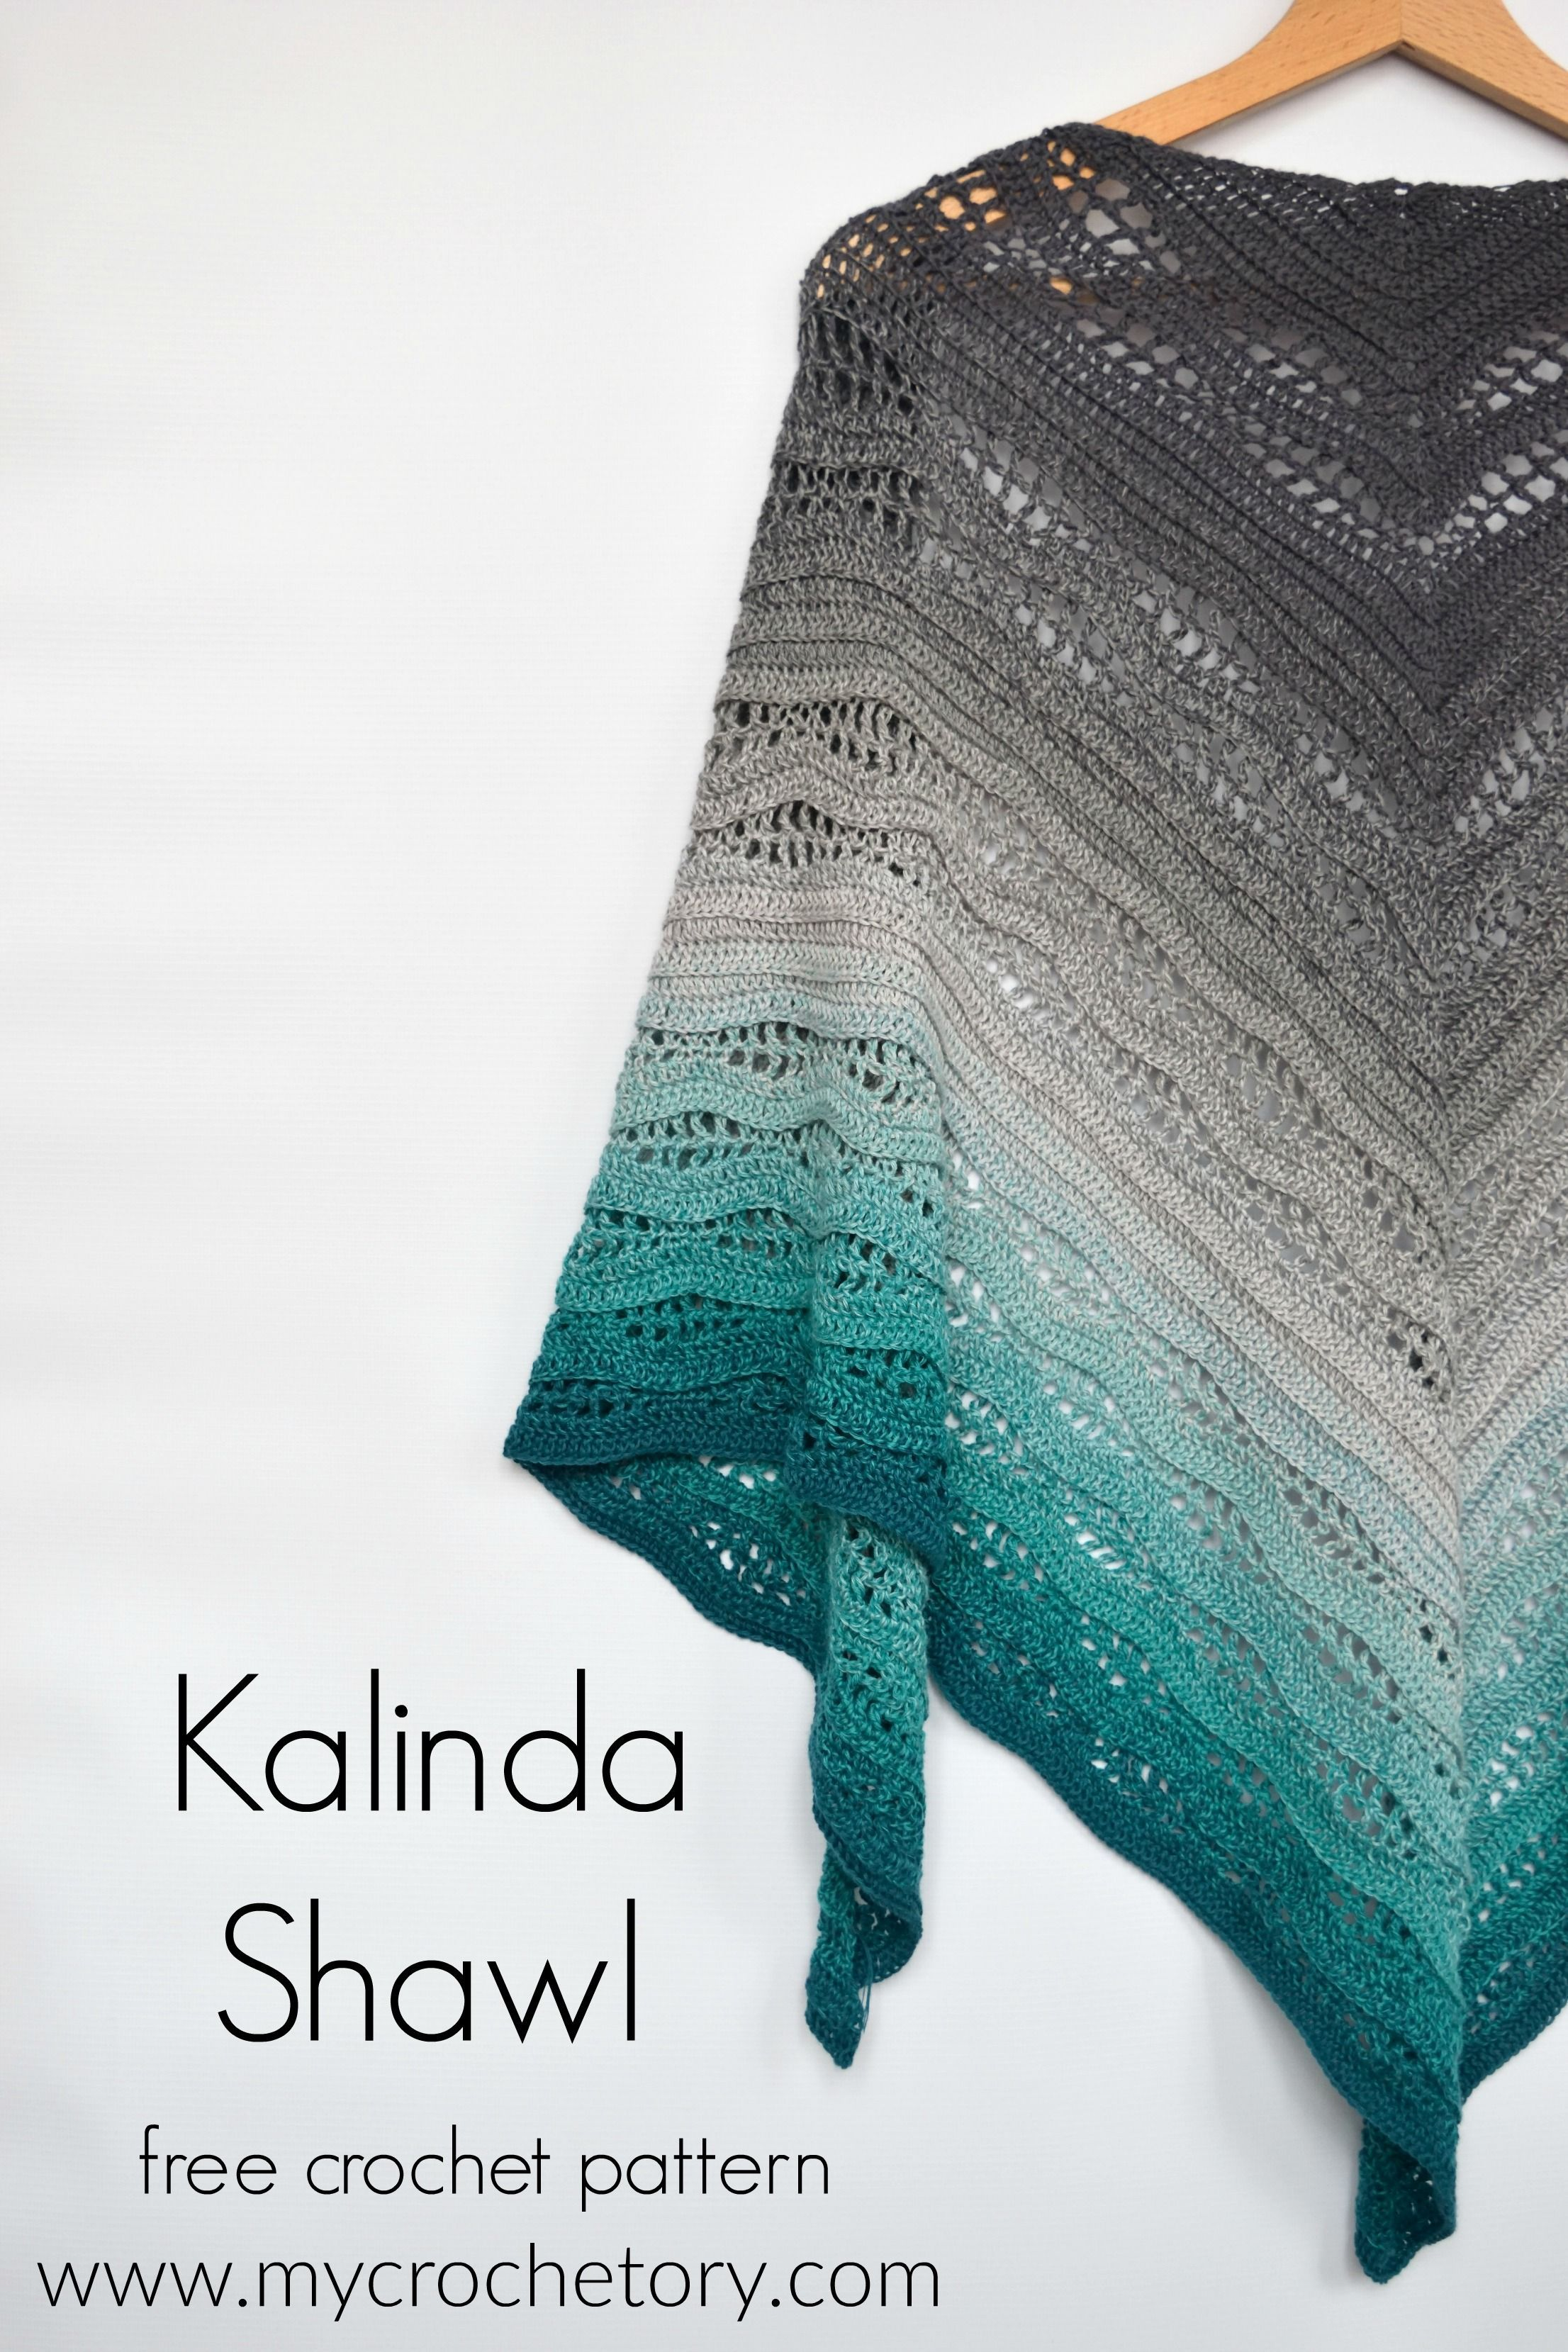 Kalinda Shawl - free crochet pattern by #shawlcrochetpattern